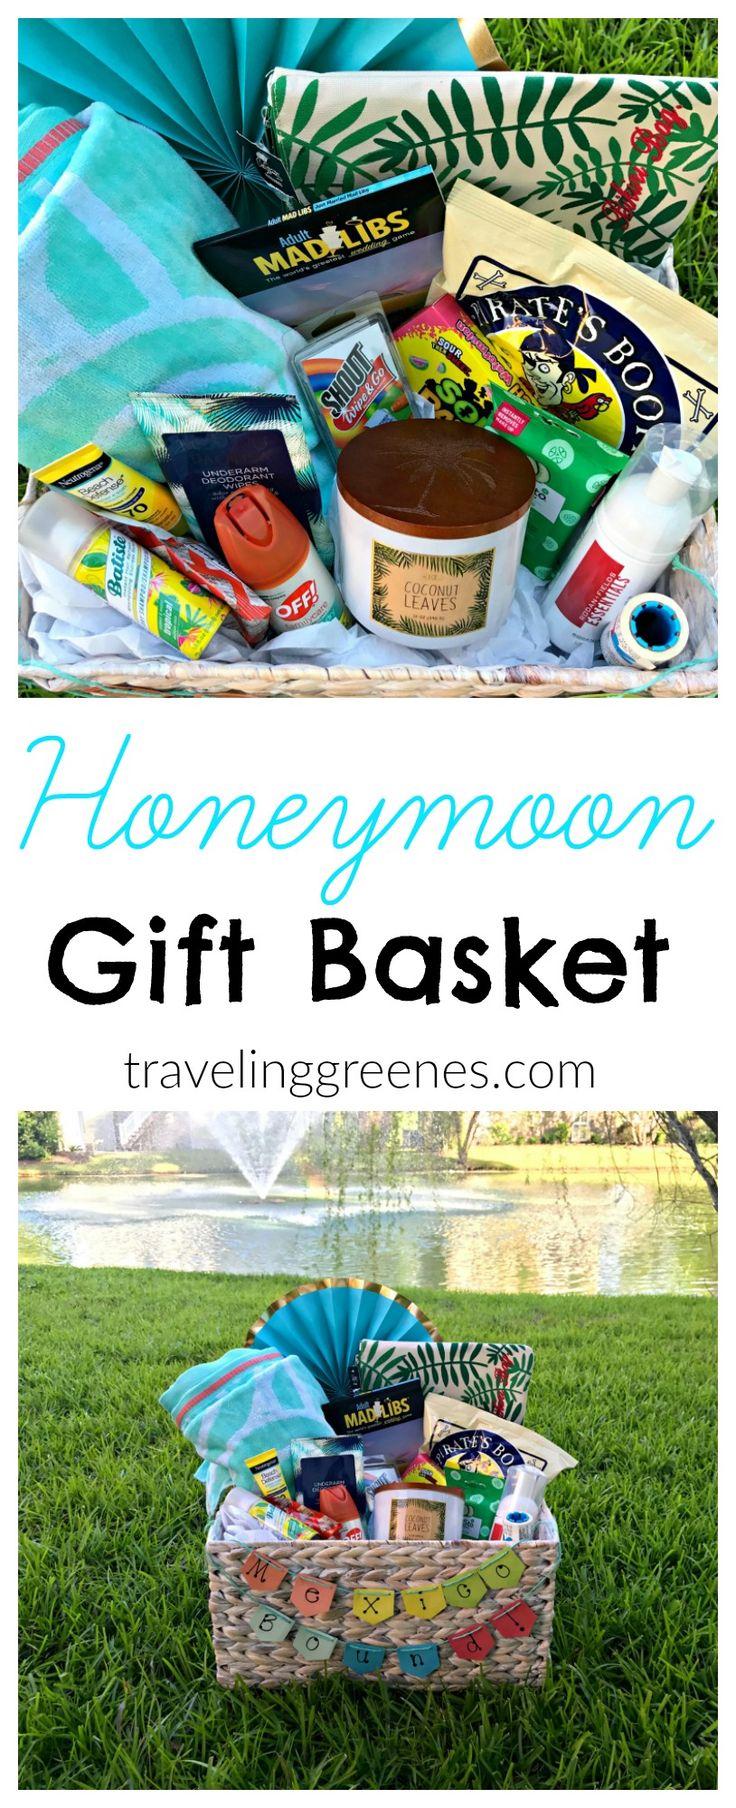 honeymoon must-have travel essentials!